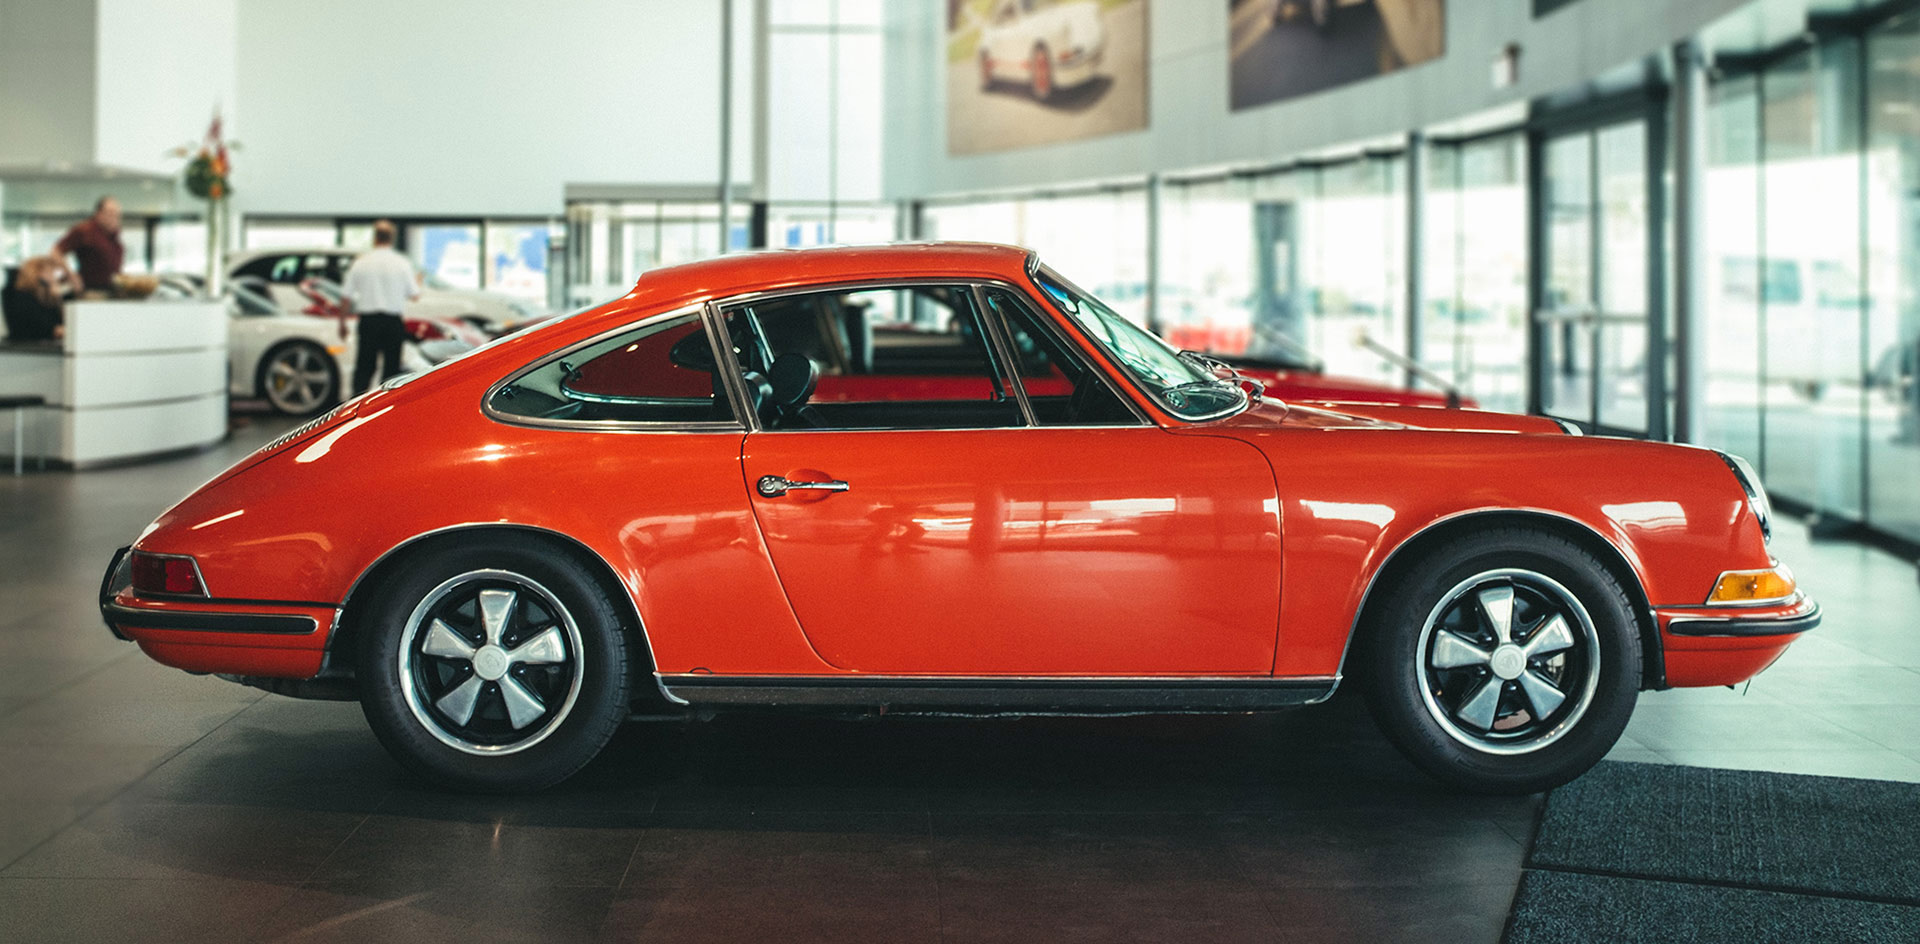 Porsche Fuchs Wheels From The Beginning Until Today Cw Performance Wheels Gmbh